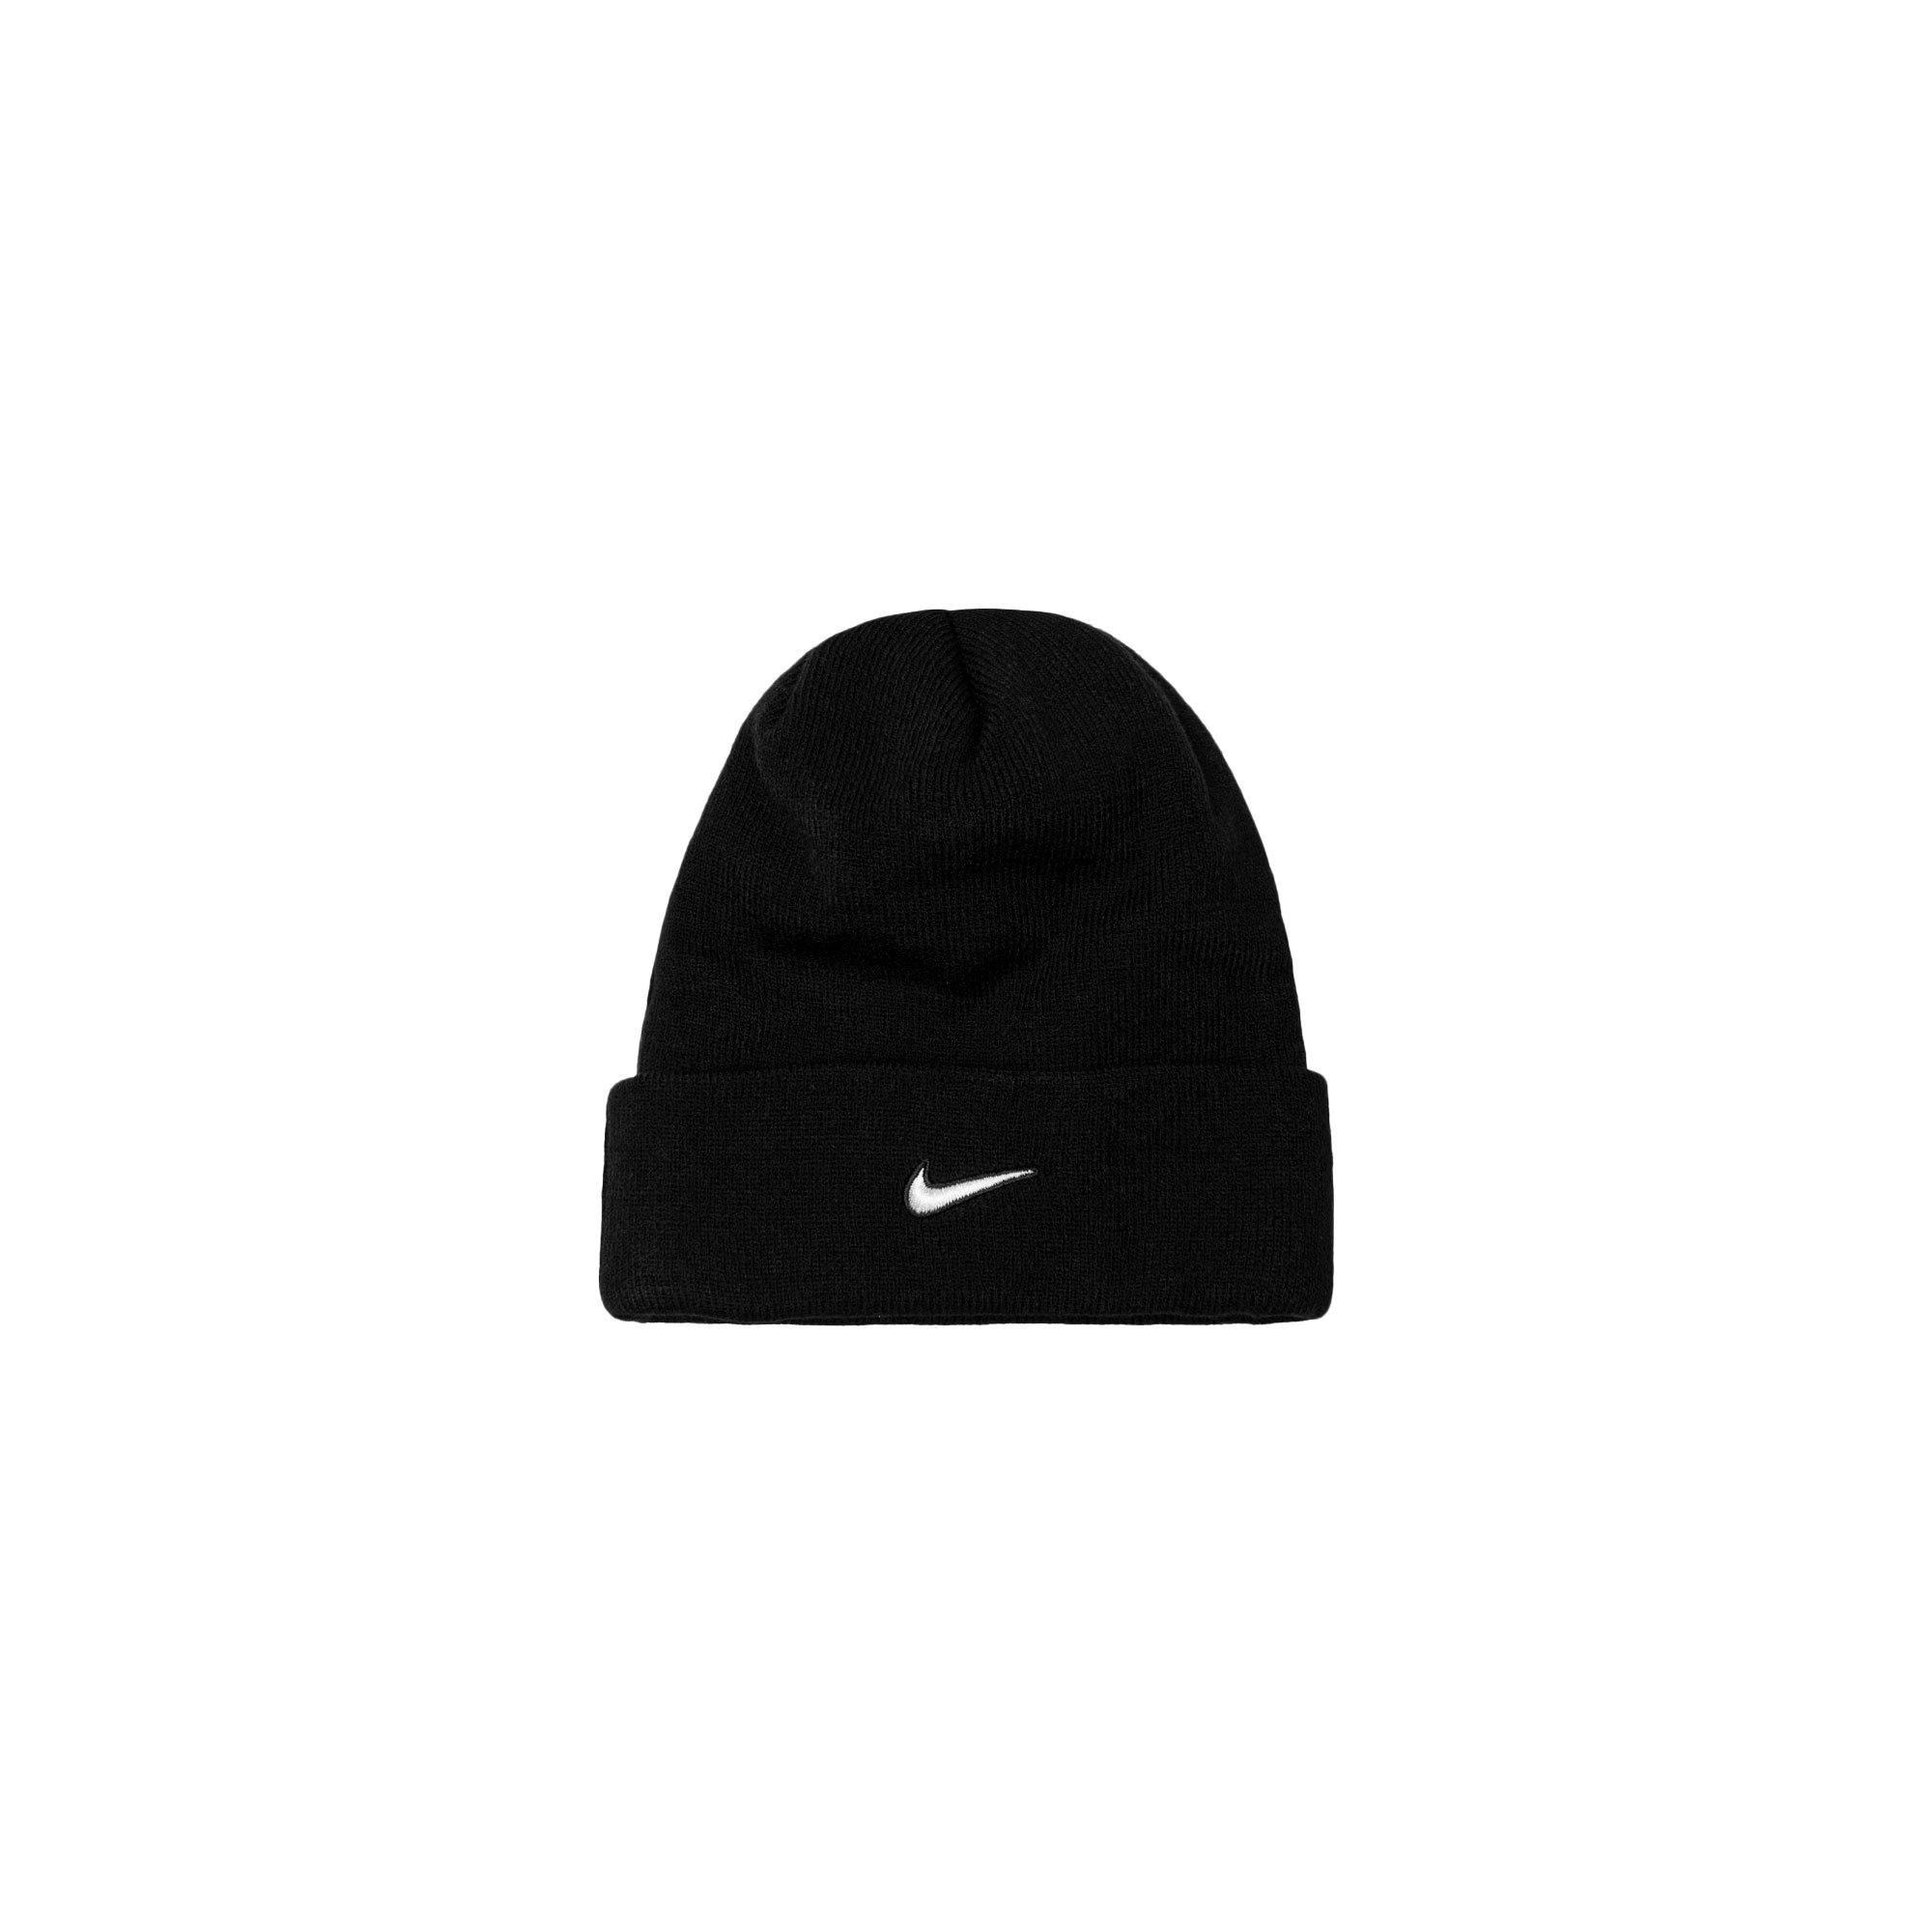 Kith Nike Just Us Beanie Black - FW17